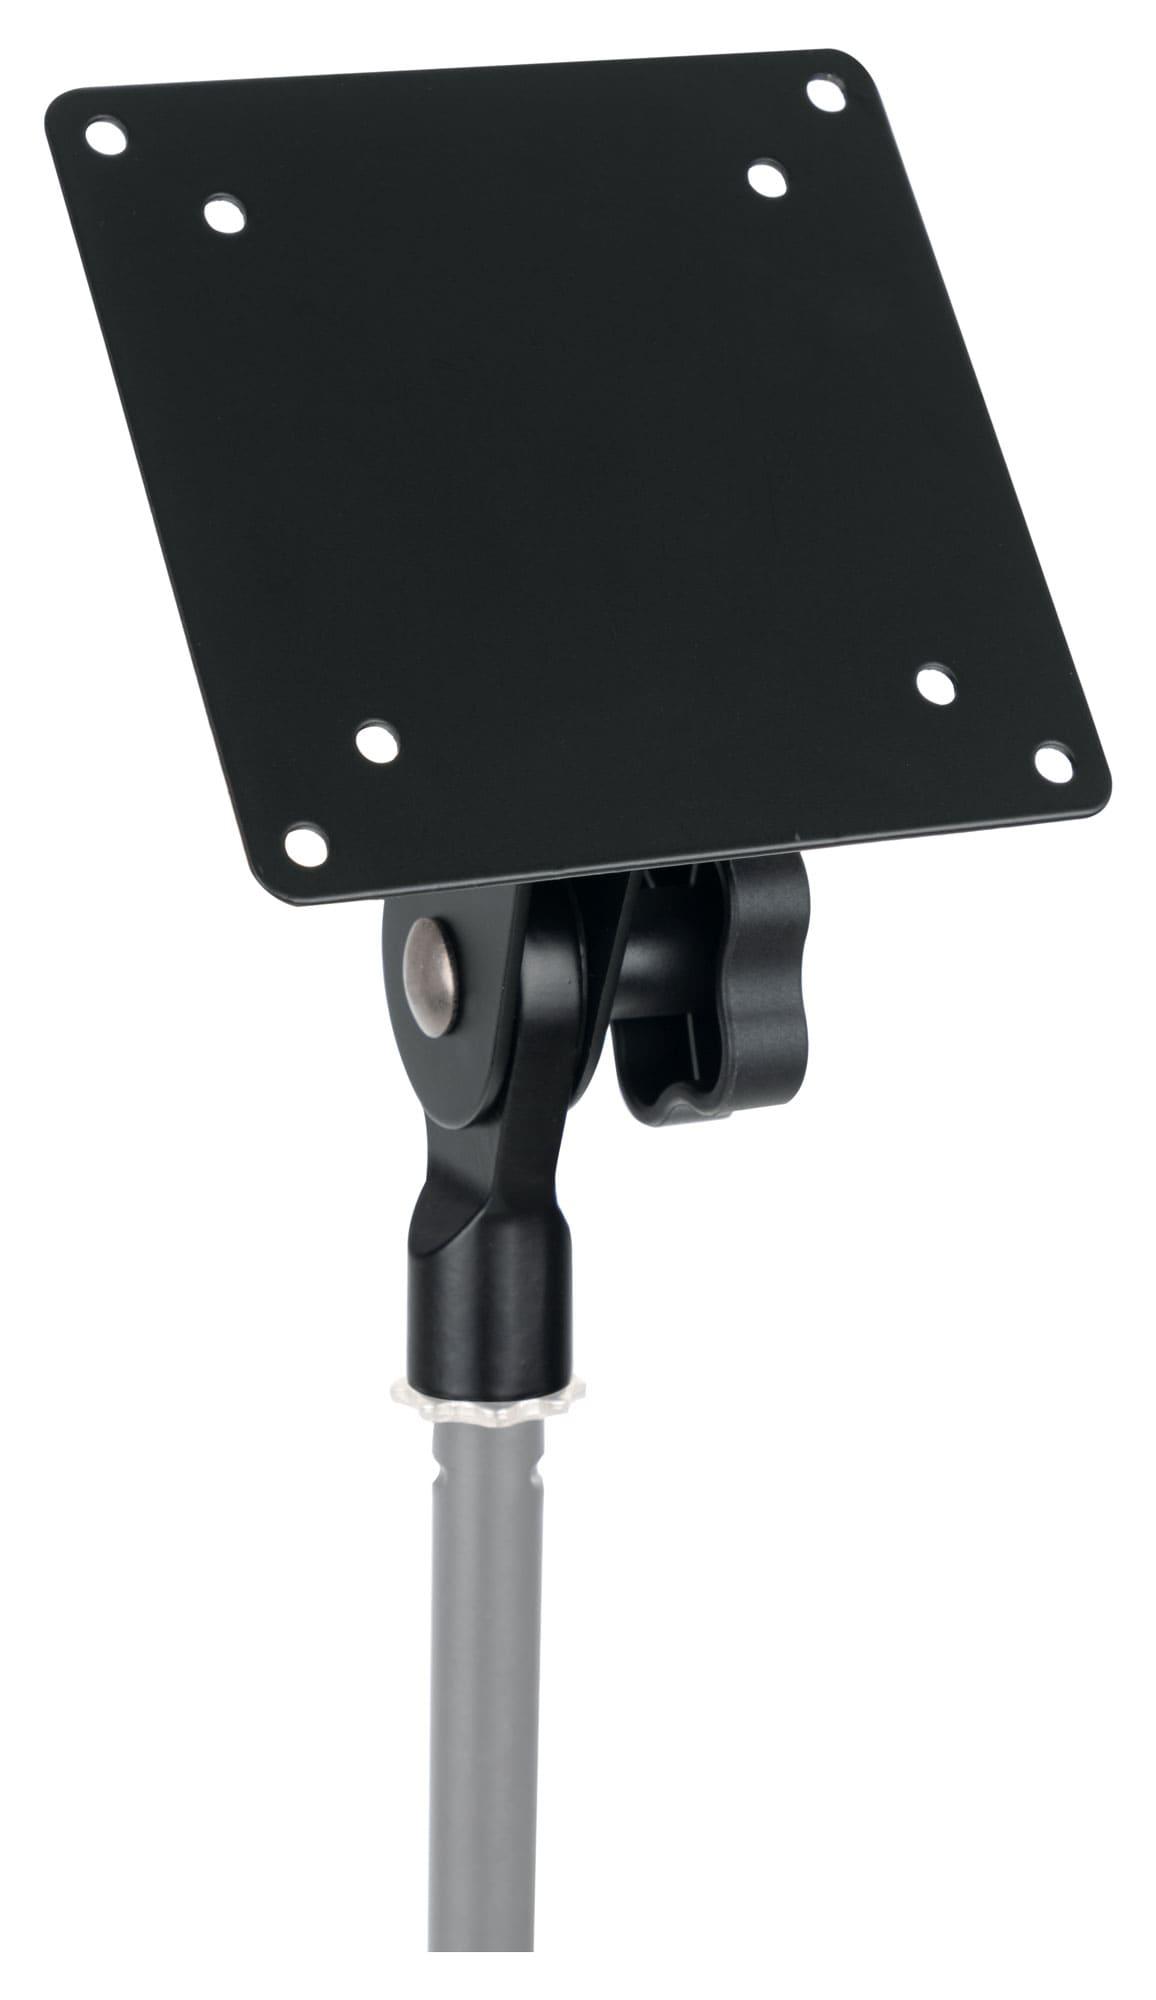 Studiozubehoer - Pronomic Mikrofonstativ Adapter mit VESA Mount für LED|TFT Displays - Onlineshop Musikhaus Kirstein